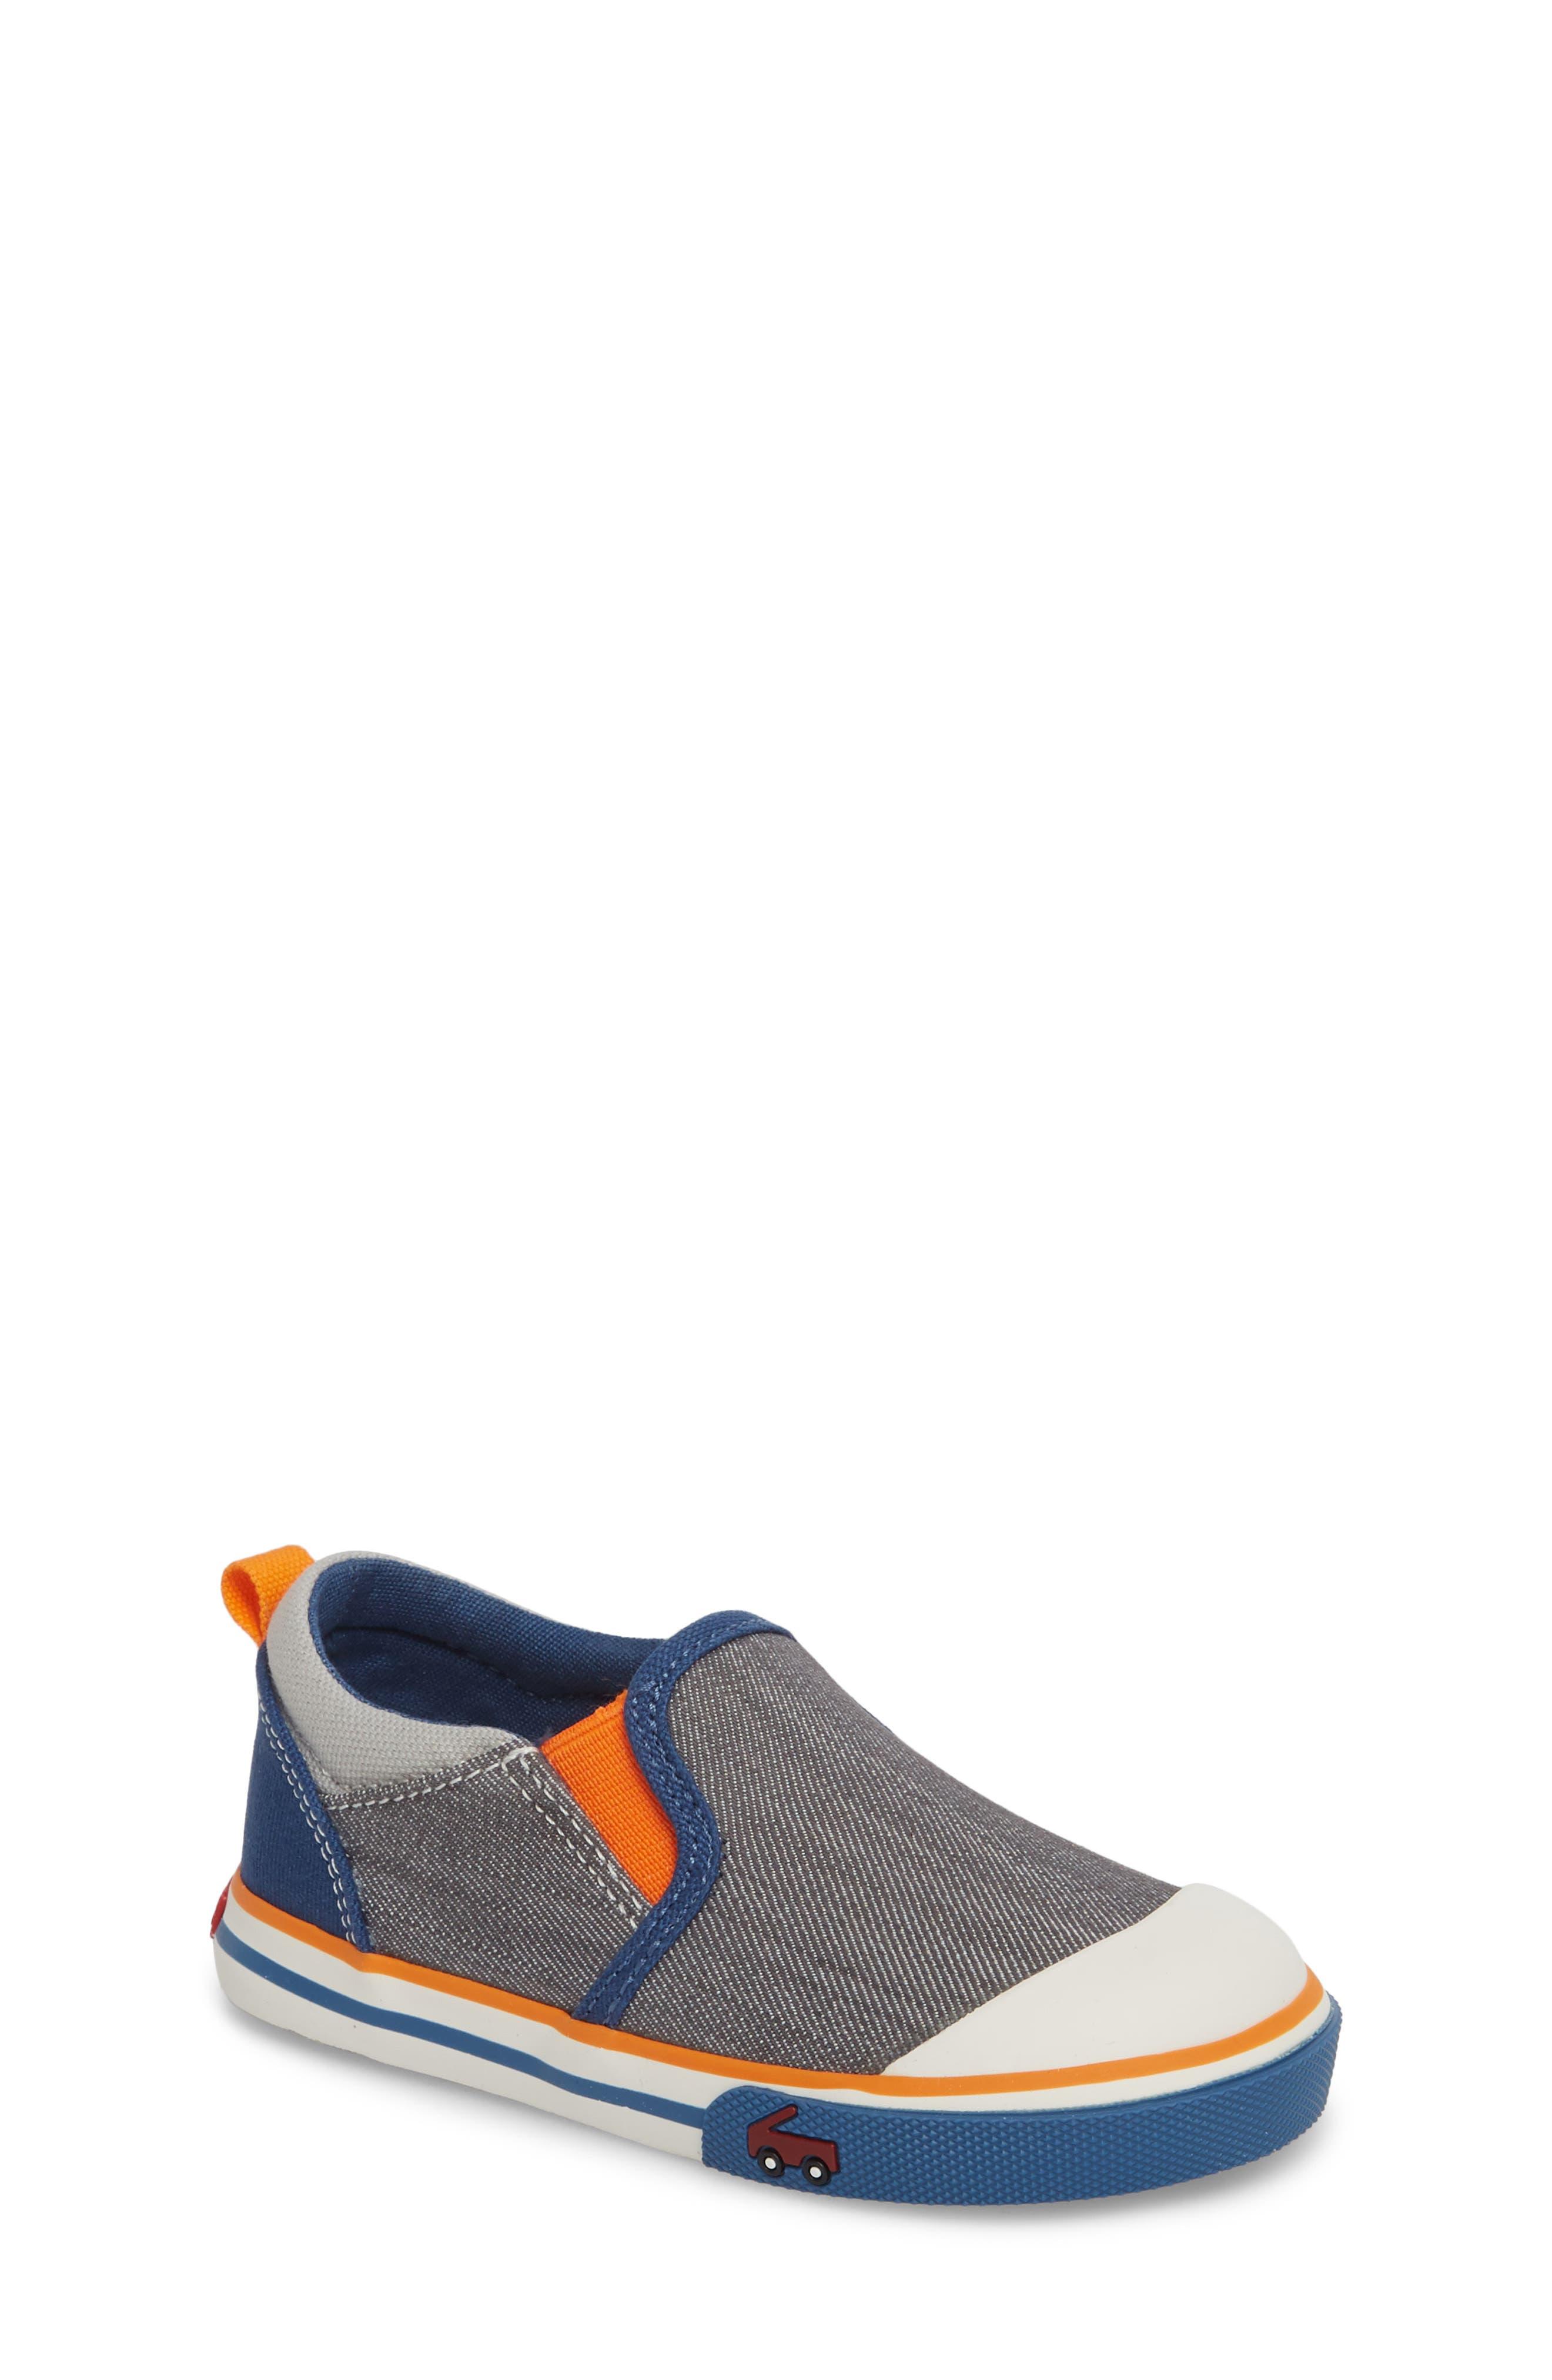 Slater Colorblock Slip-On Sneaker,                         Main,                         color, Gray/ Blue